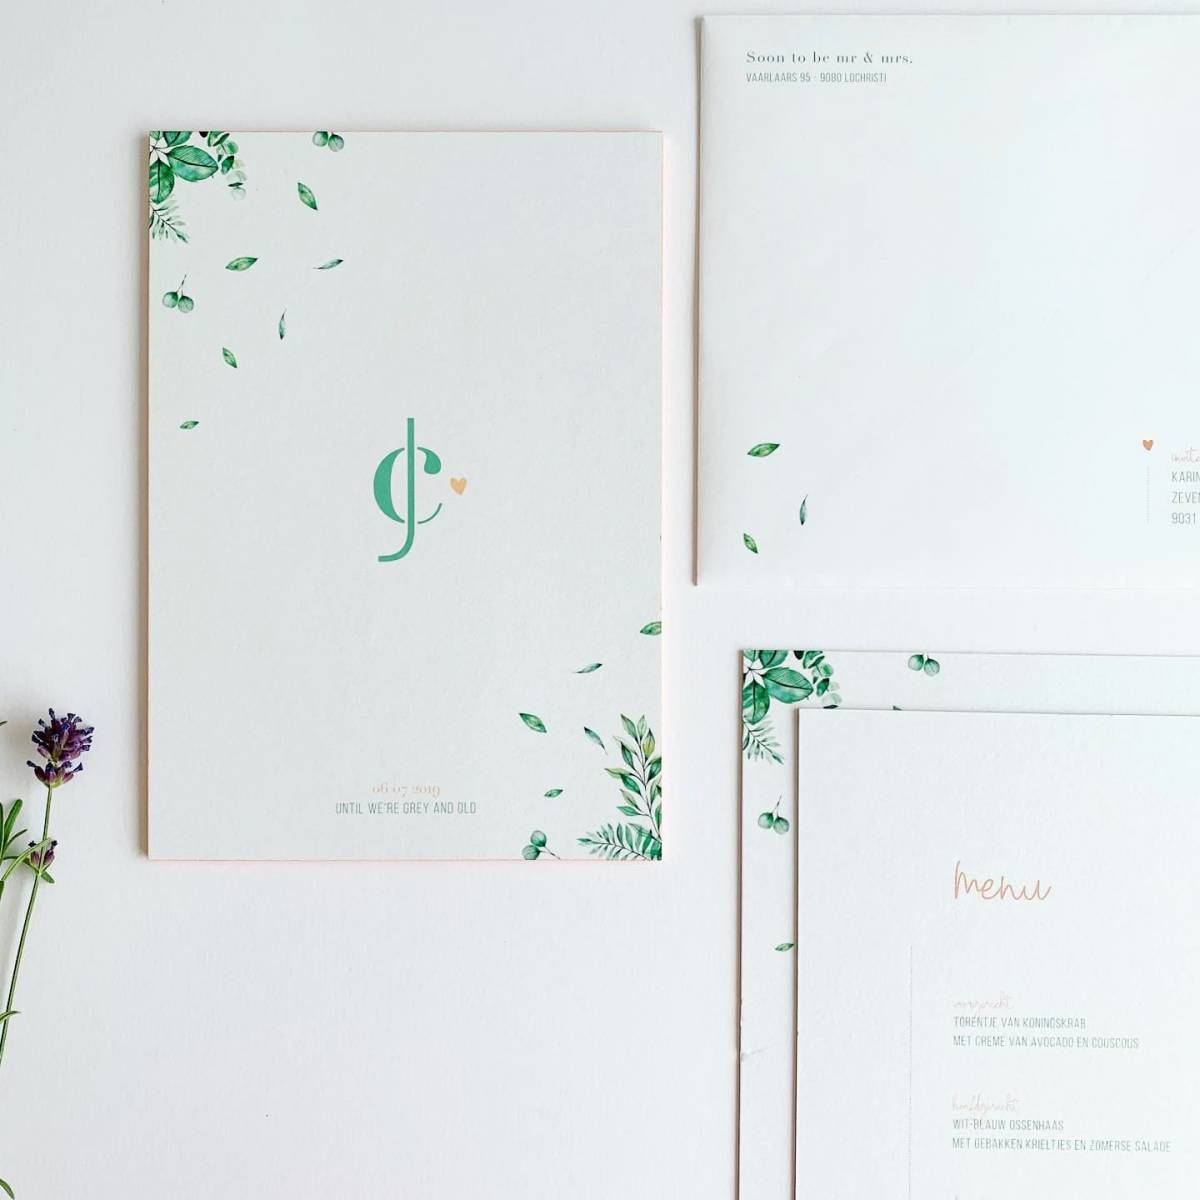 Scarabar - Trouwuitnodiging - Huwelijksuitnodiging - Drukwerk - Huwelijk - Trouw - Bruiloft - House of Weddings - 30